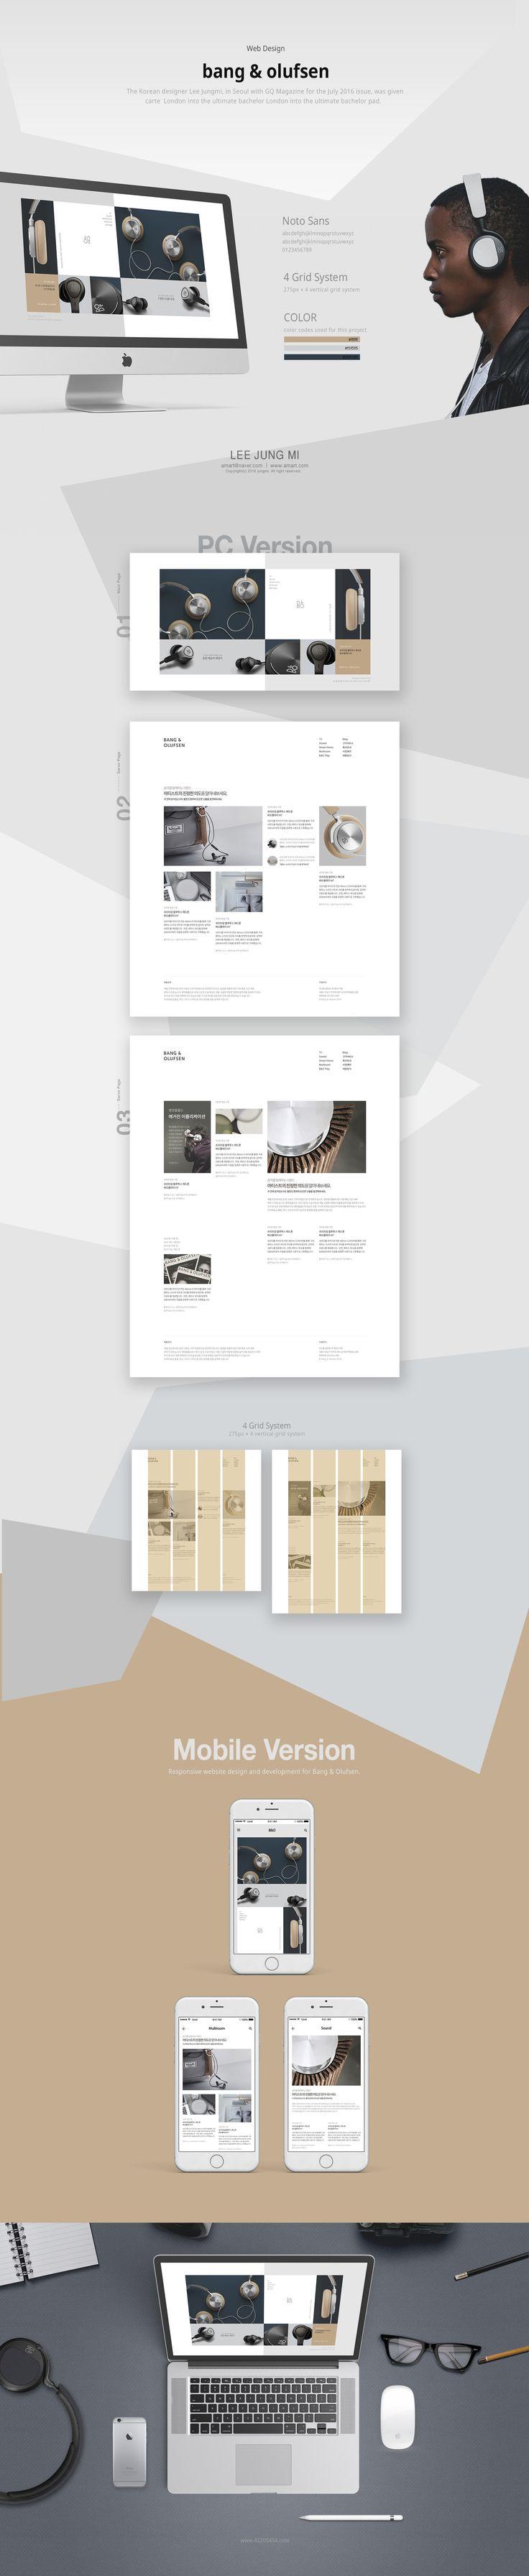 UKSWEB Design Academy on Behance